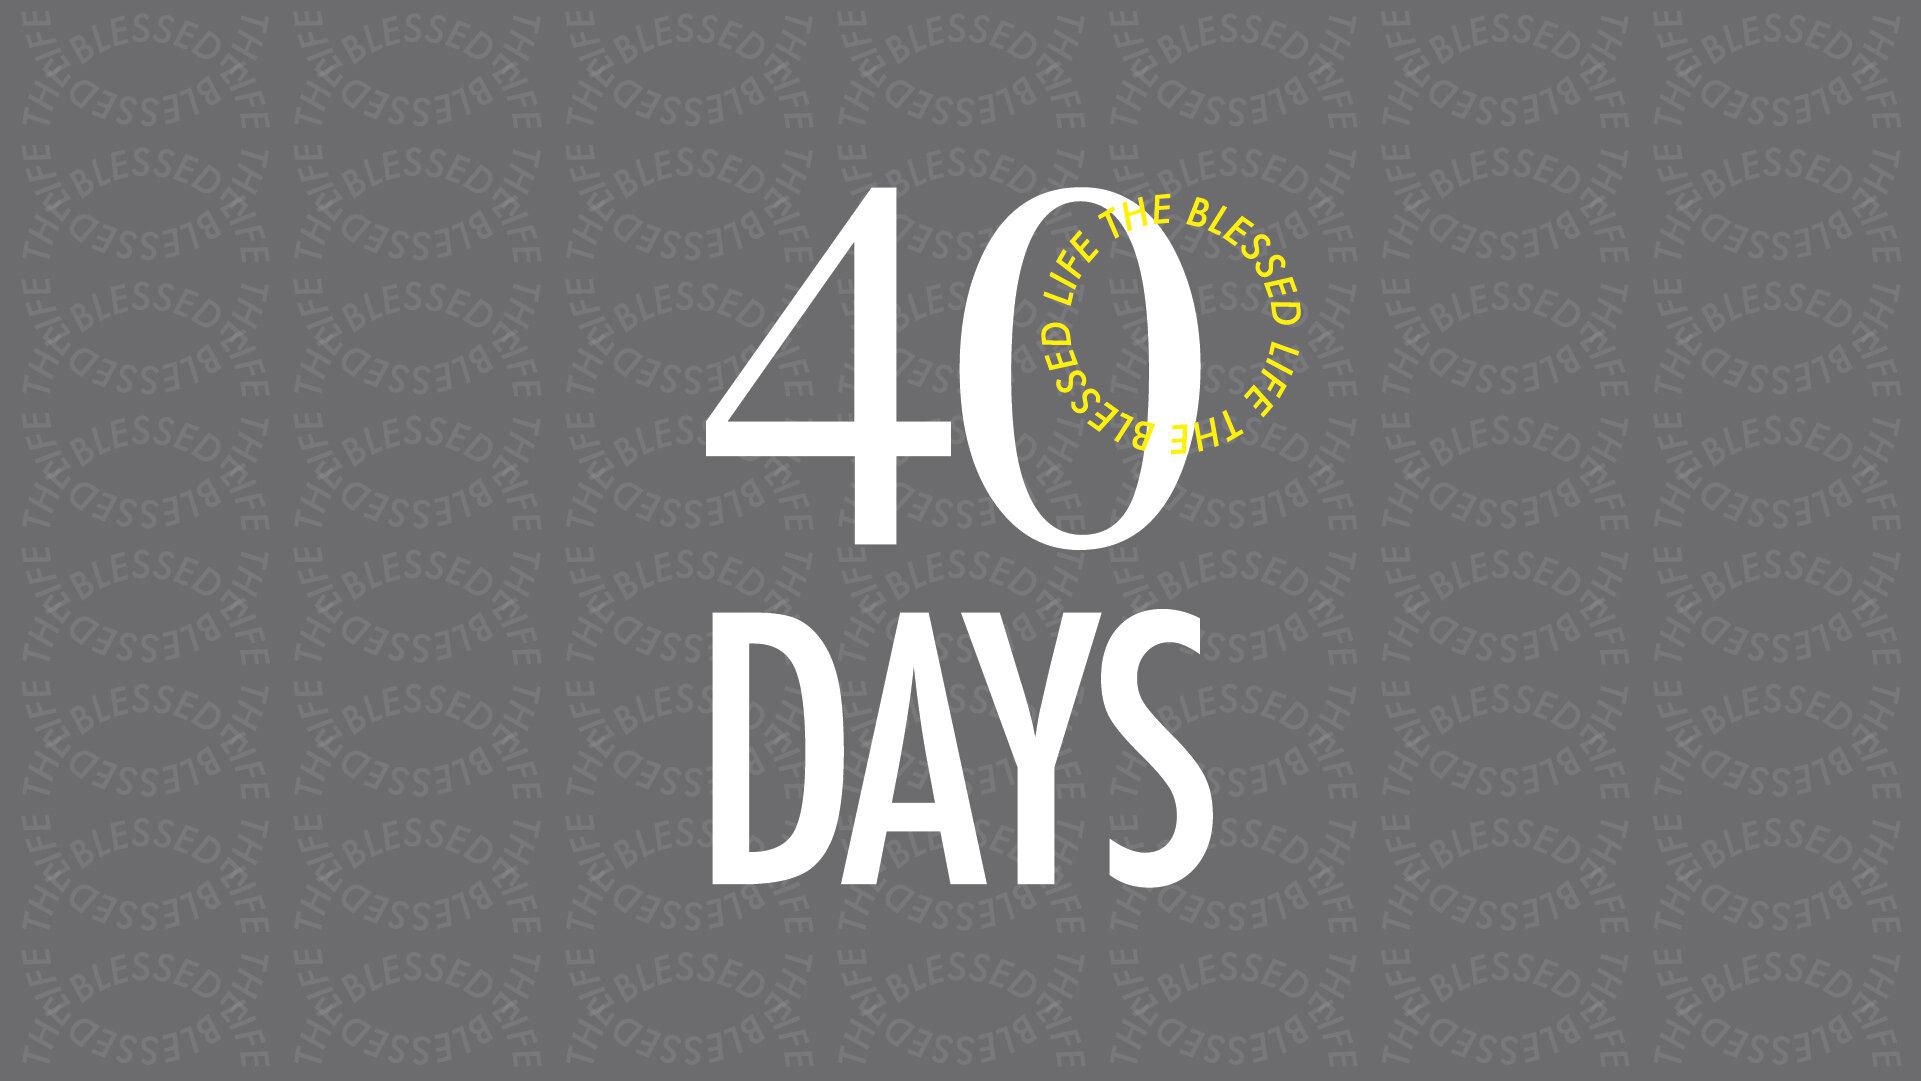 40days-series(1920x1080).jpg